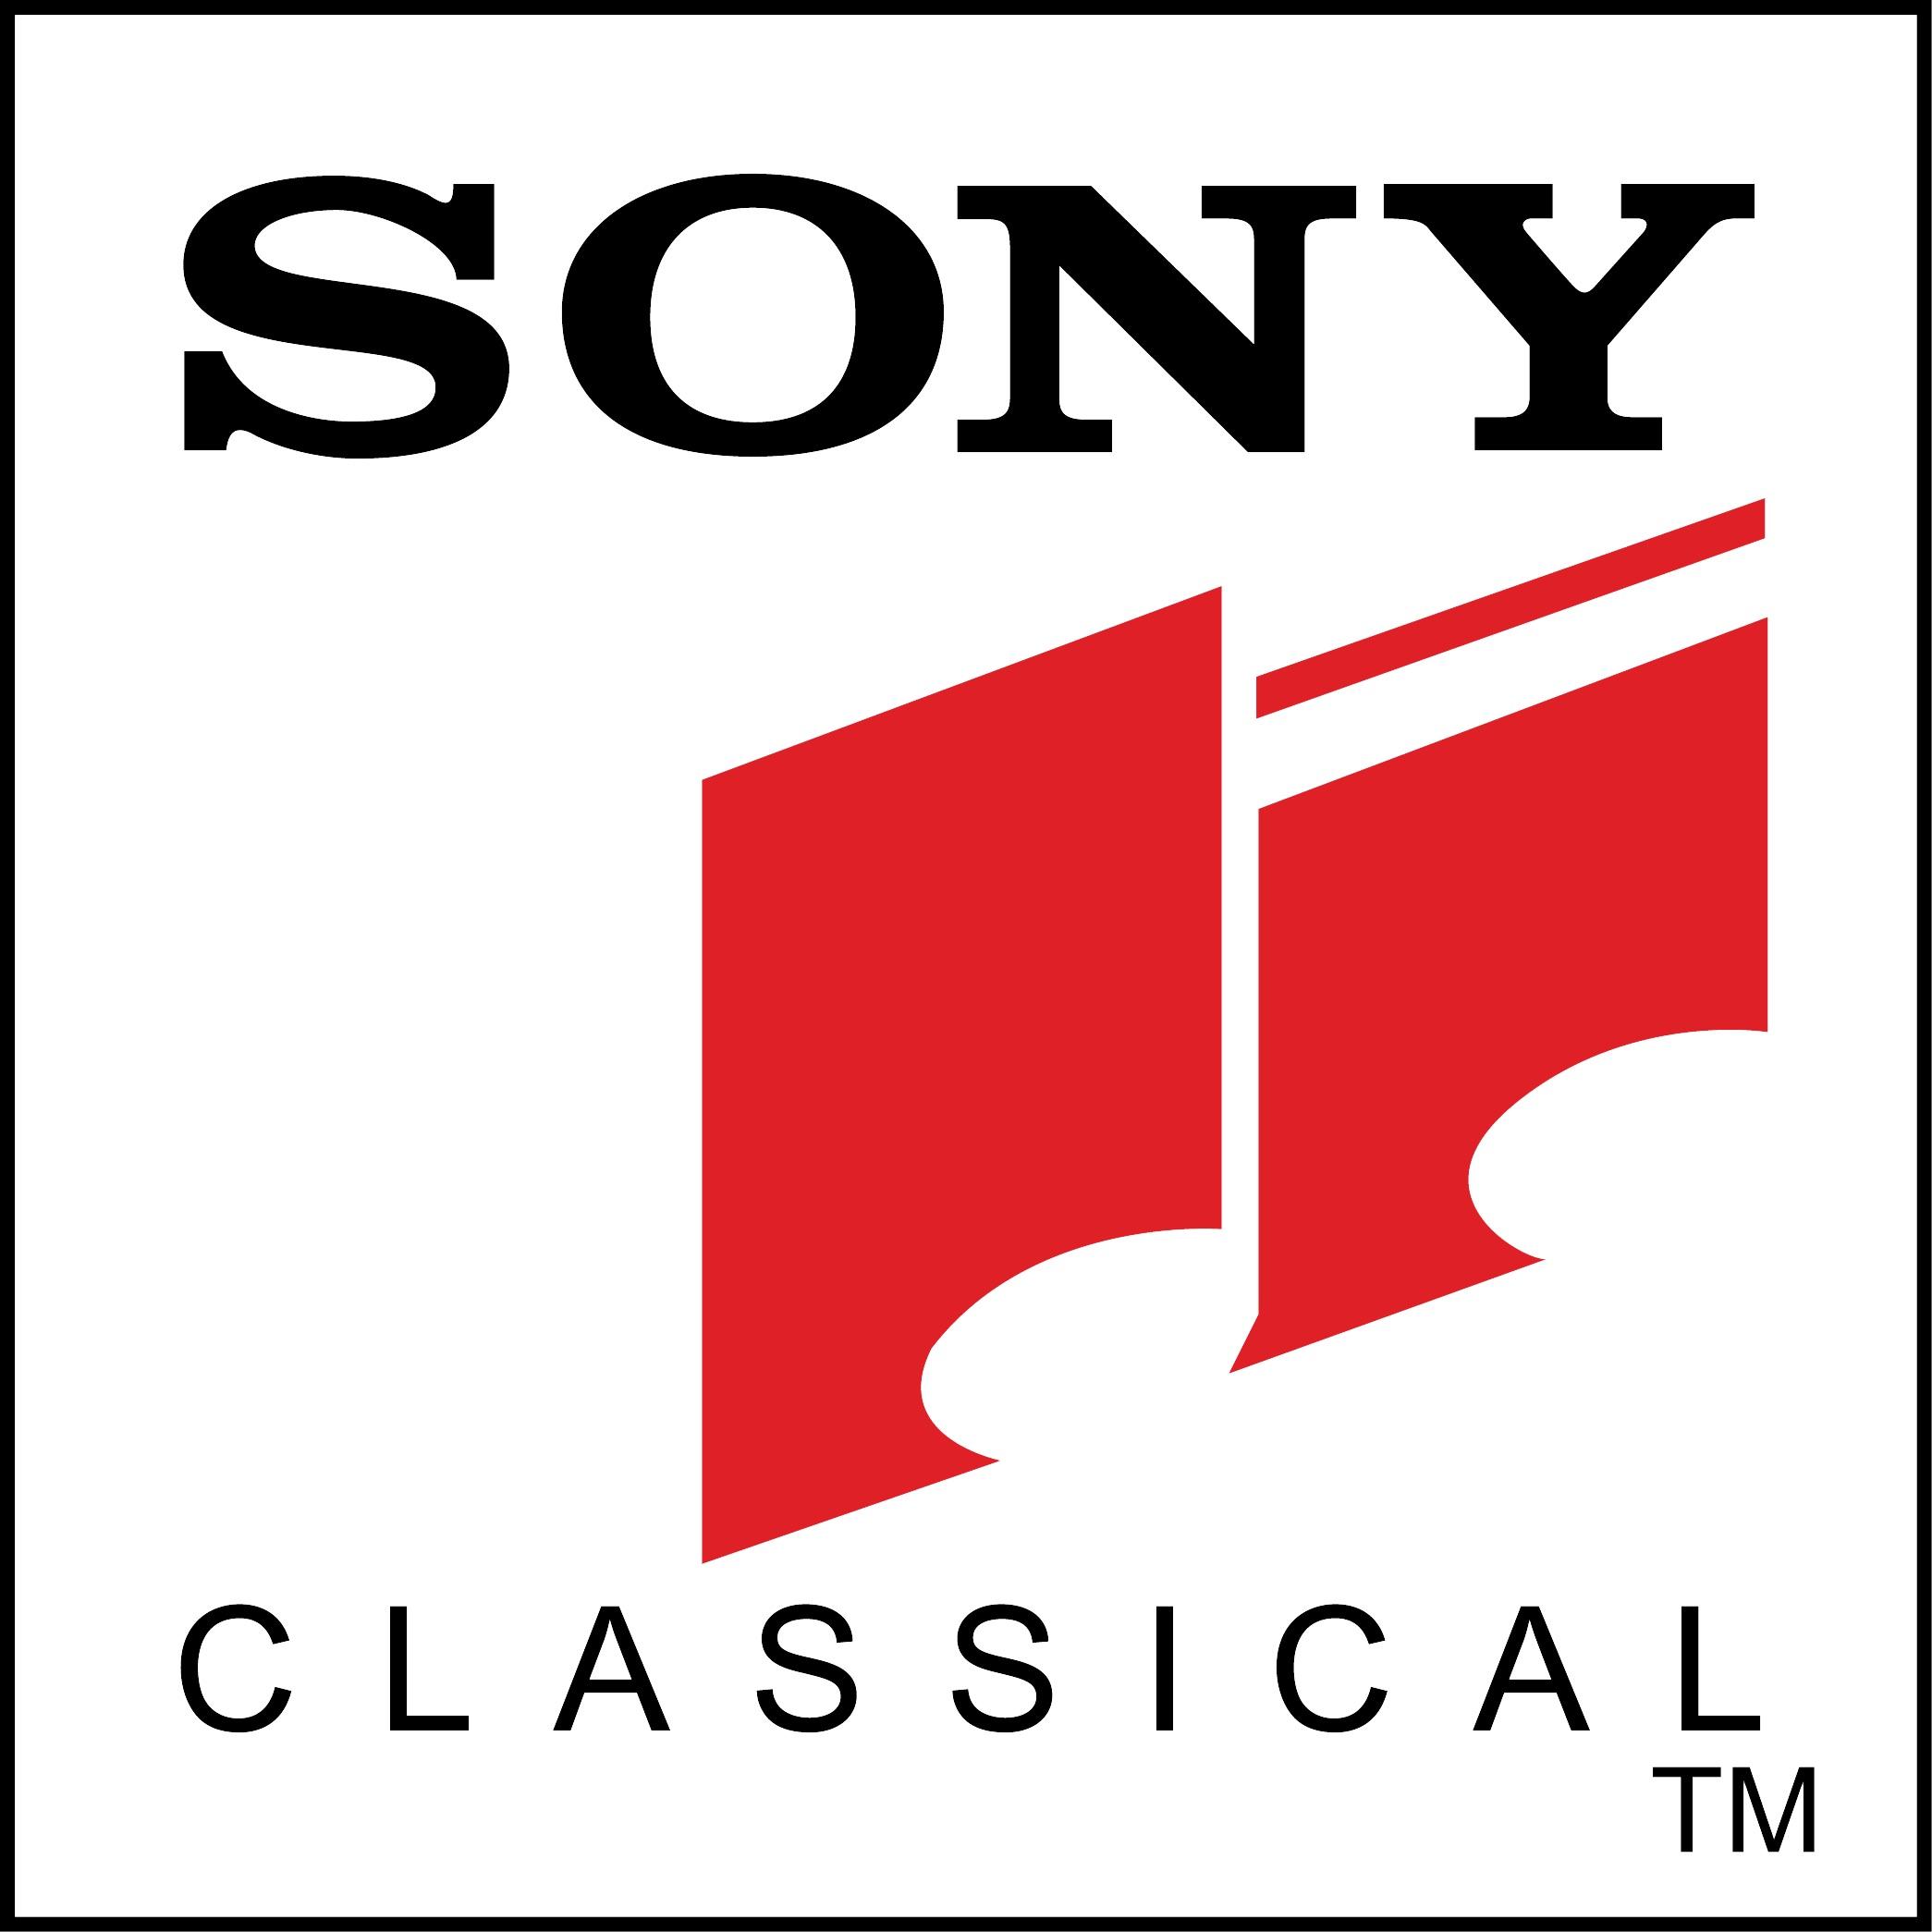 Sony Classical logo variant 1983-2013